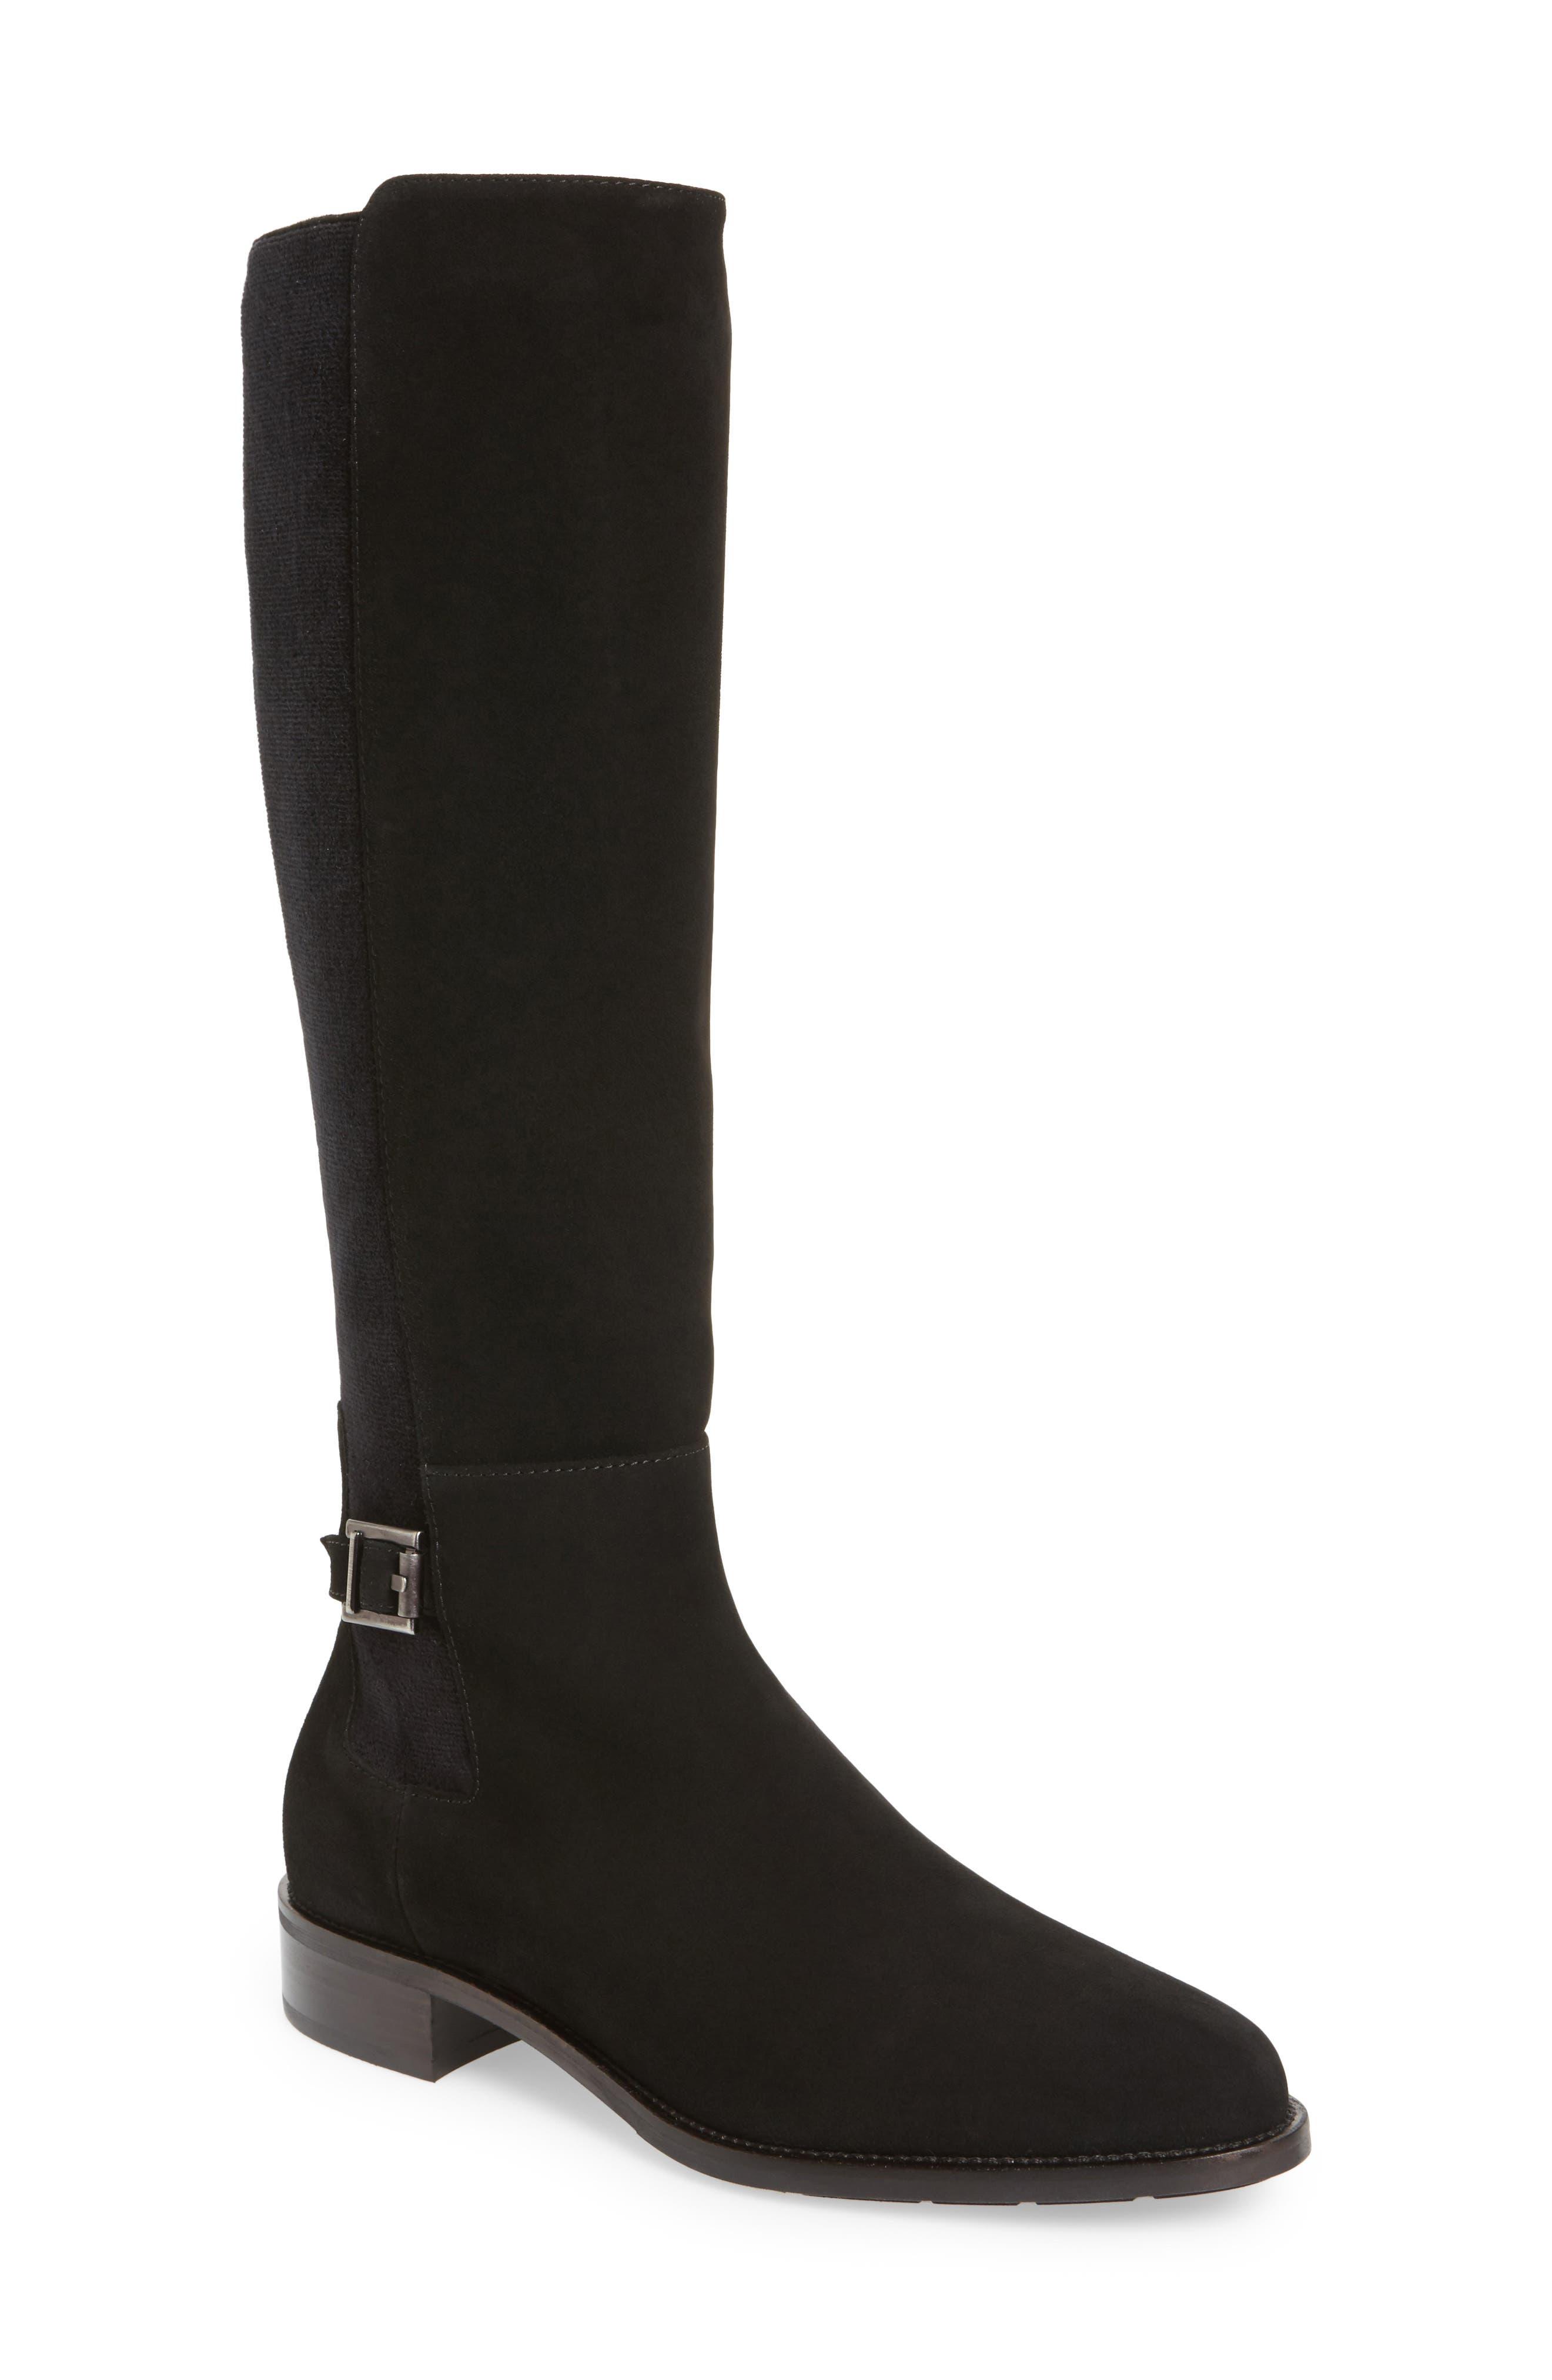 Aquatalia Noella Weatherproof Tall Boot (Women)